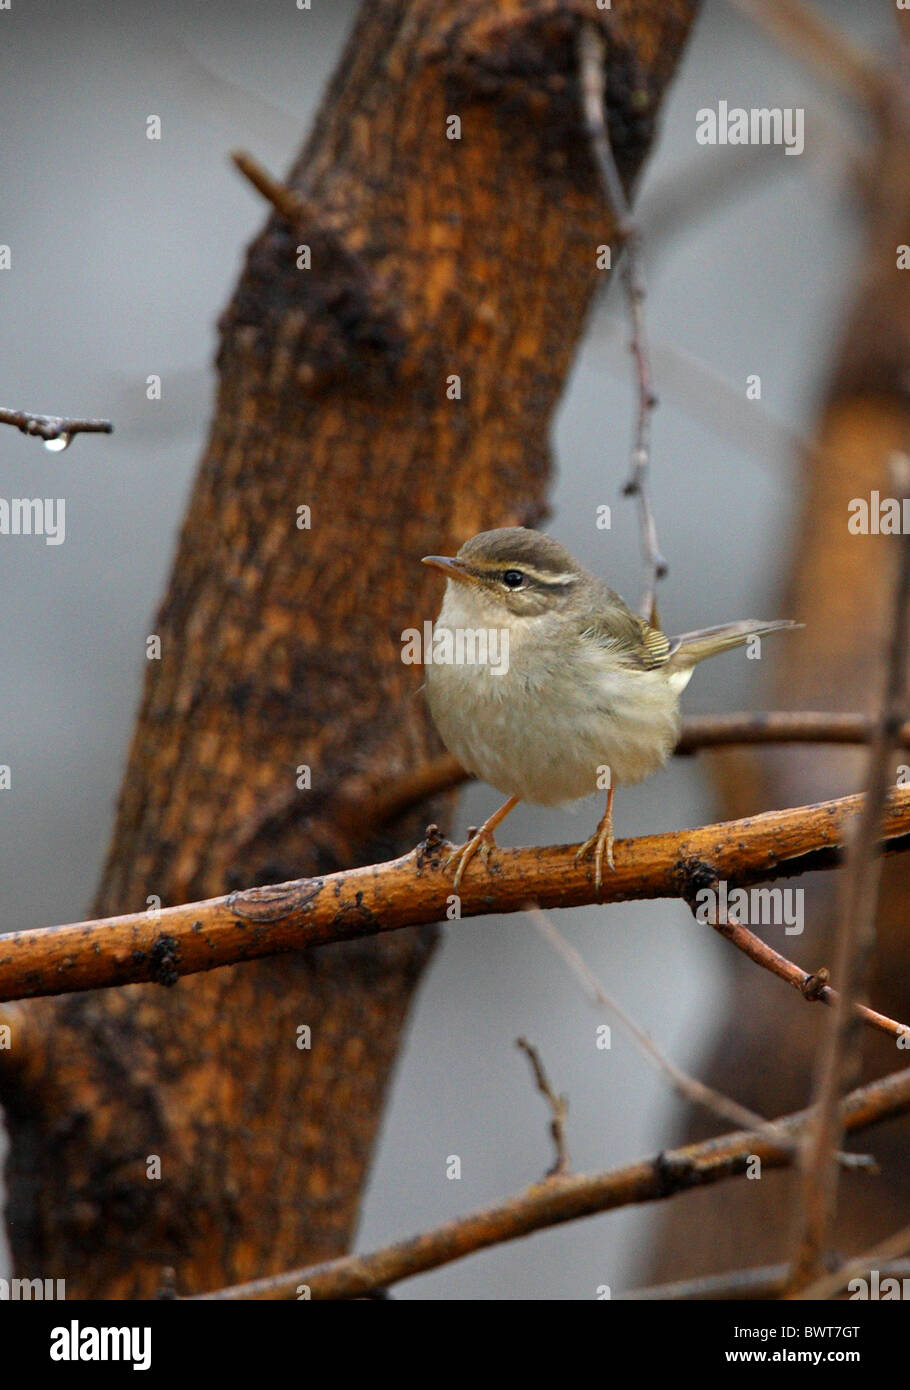 "bird birds animal animals warbler warblers asia asian wildlife nature passerine passerines ""old world warbler"" songbird Stock Photo"